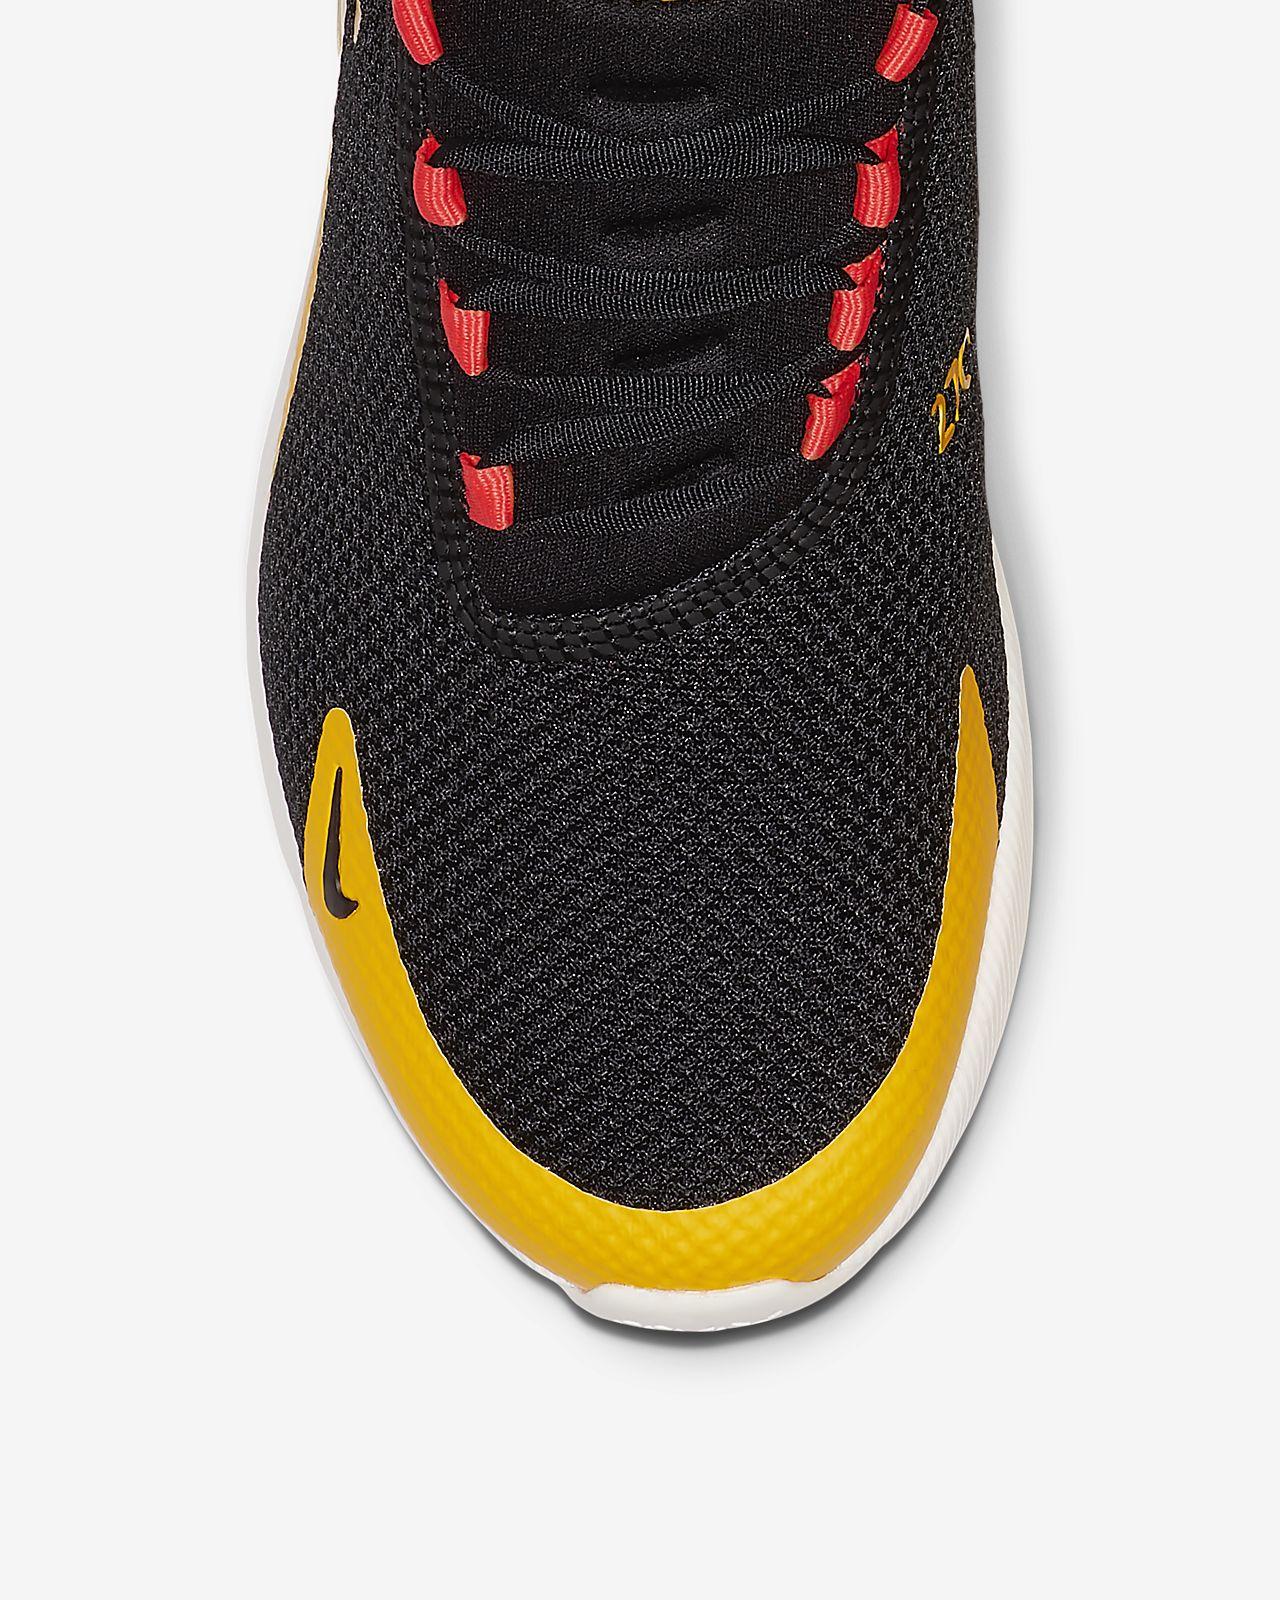 release date 34dea 14c57 Nike Air Max 270 SE Floral Women s Shoe. Nike.com